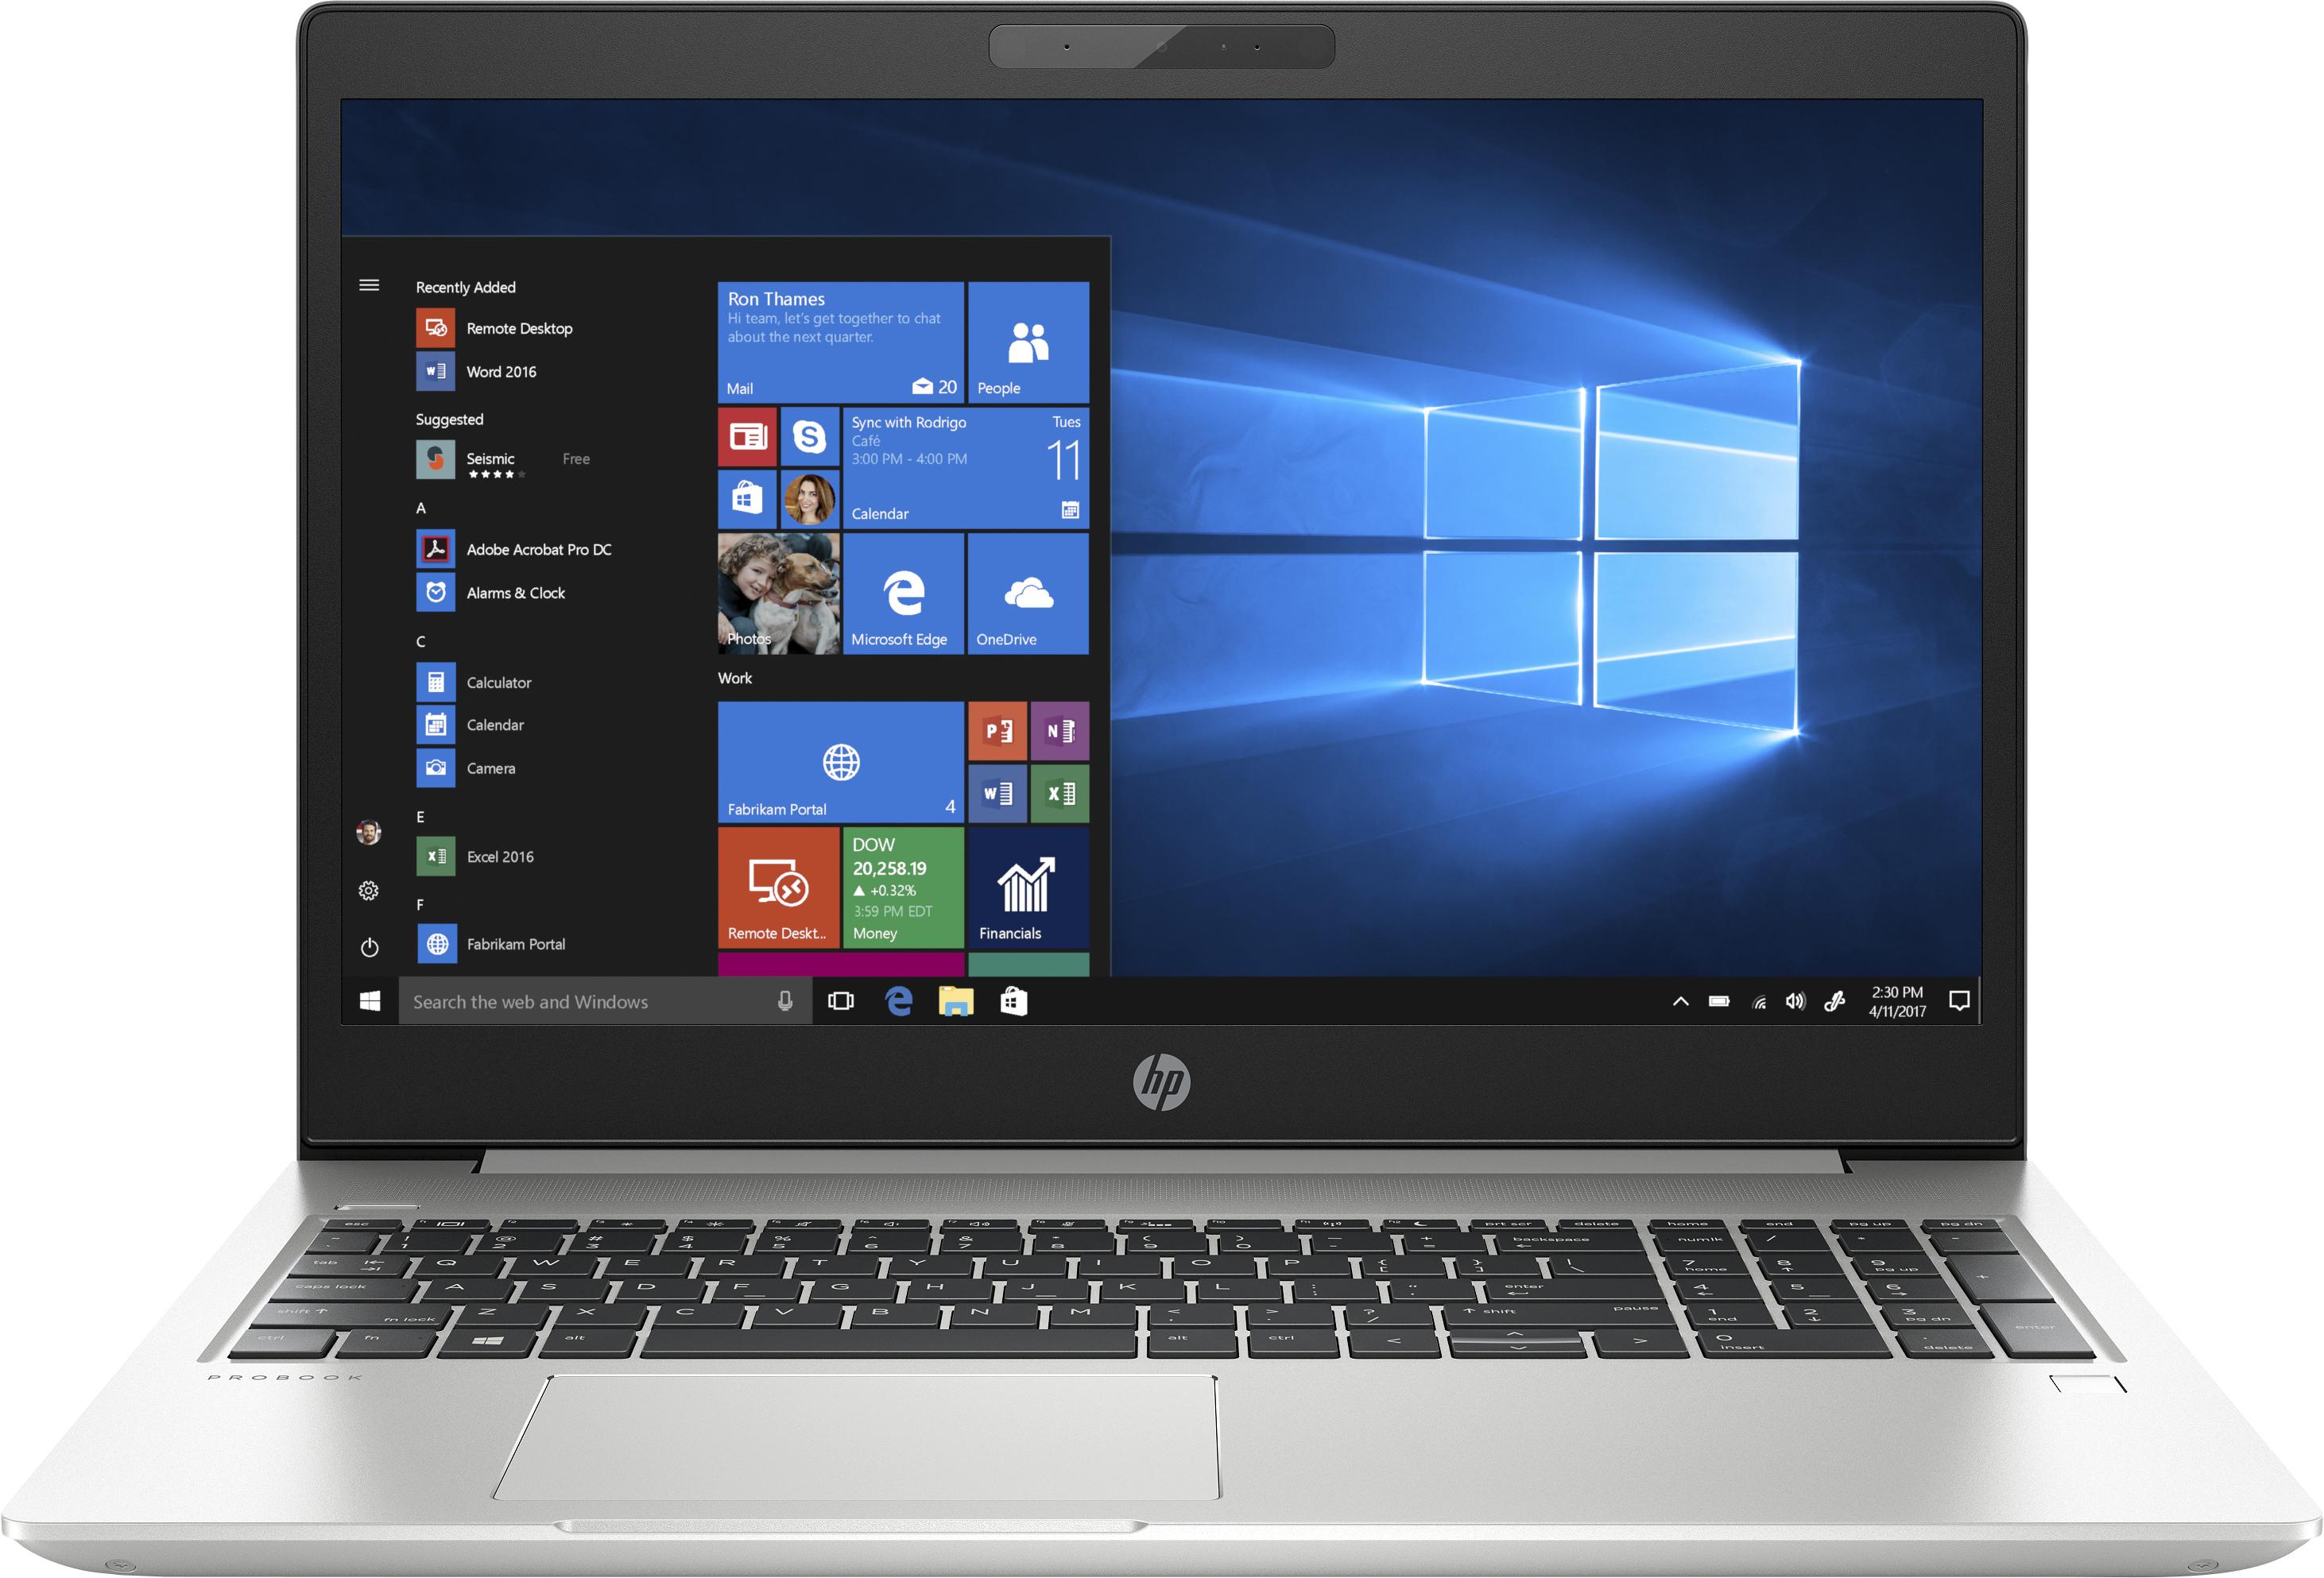 HP ProBook 450 G6 - Intel® Core™ i5 der achten Generation - 1,6 GHz - 39,6 cm (15.6 Zoll) - 1920 x 1080 Pixel - 8 GB - 256 GB